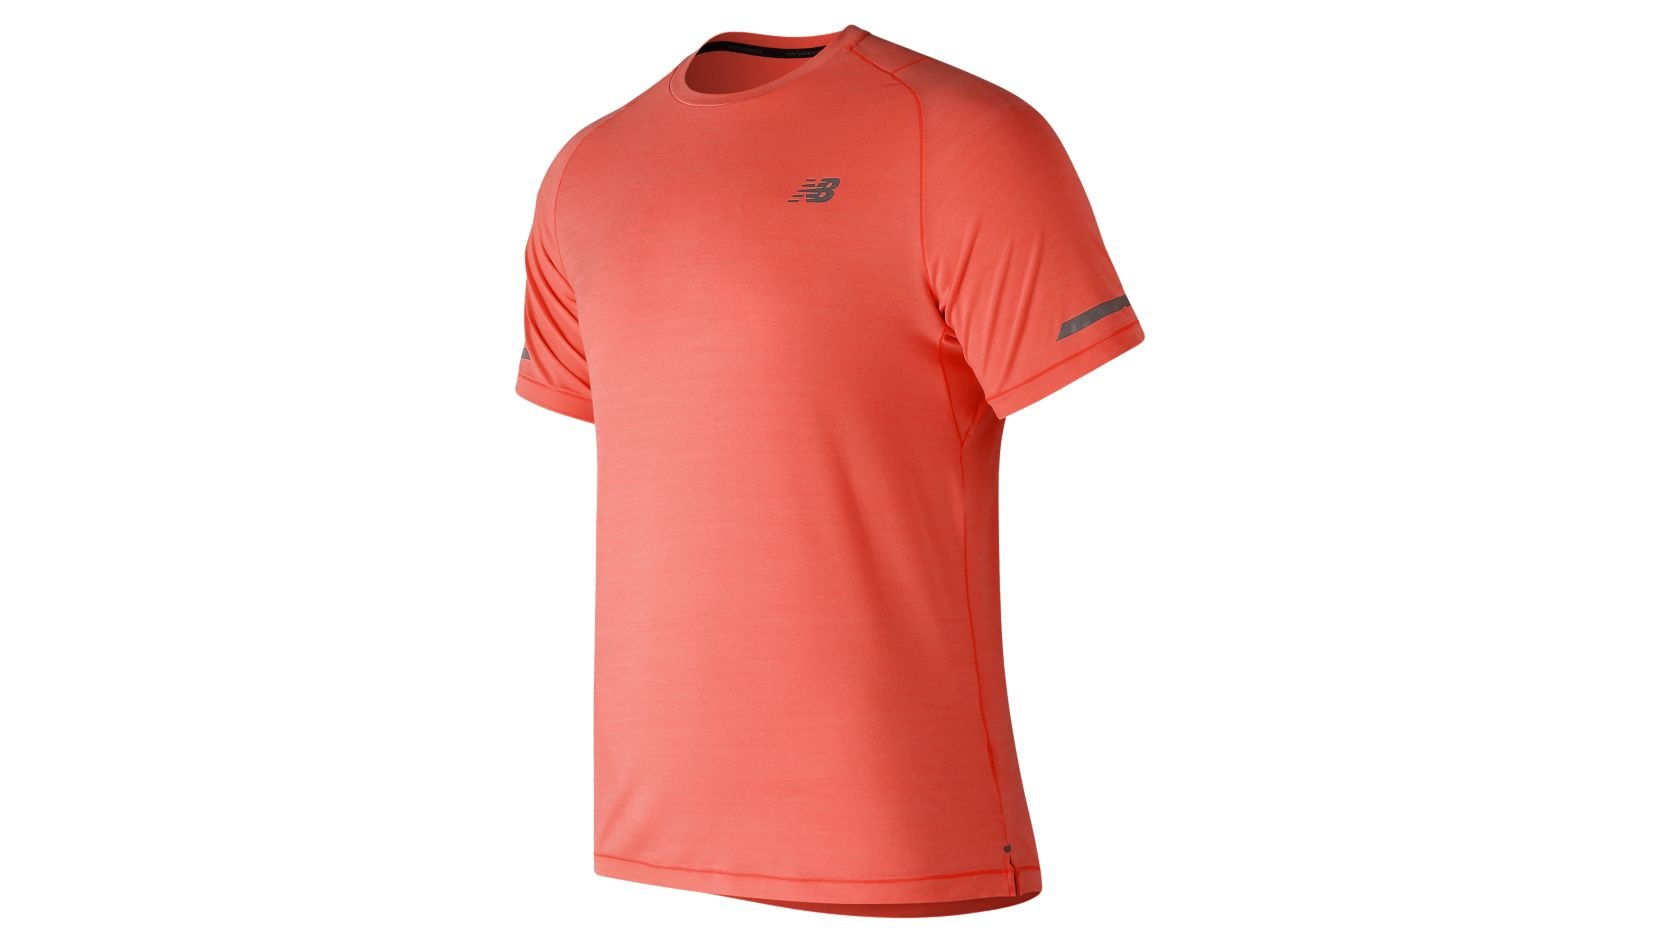 New Balance Mens Seasonless Short Sleeve T-Shirt - £30.00